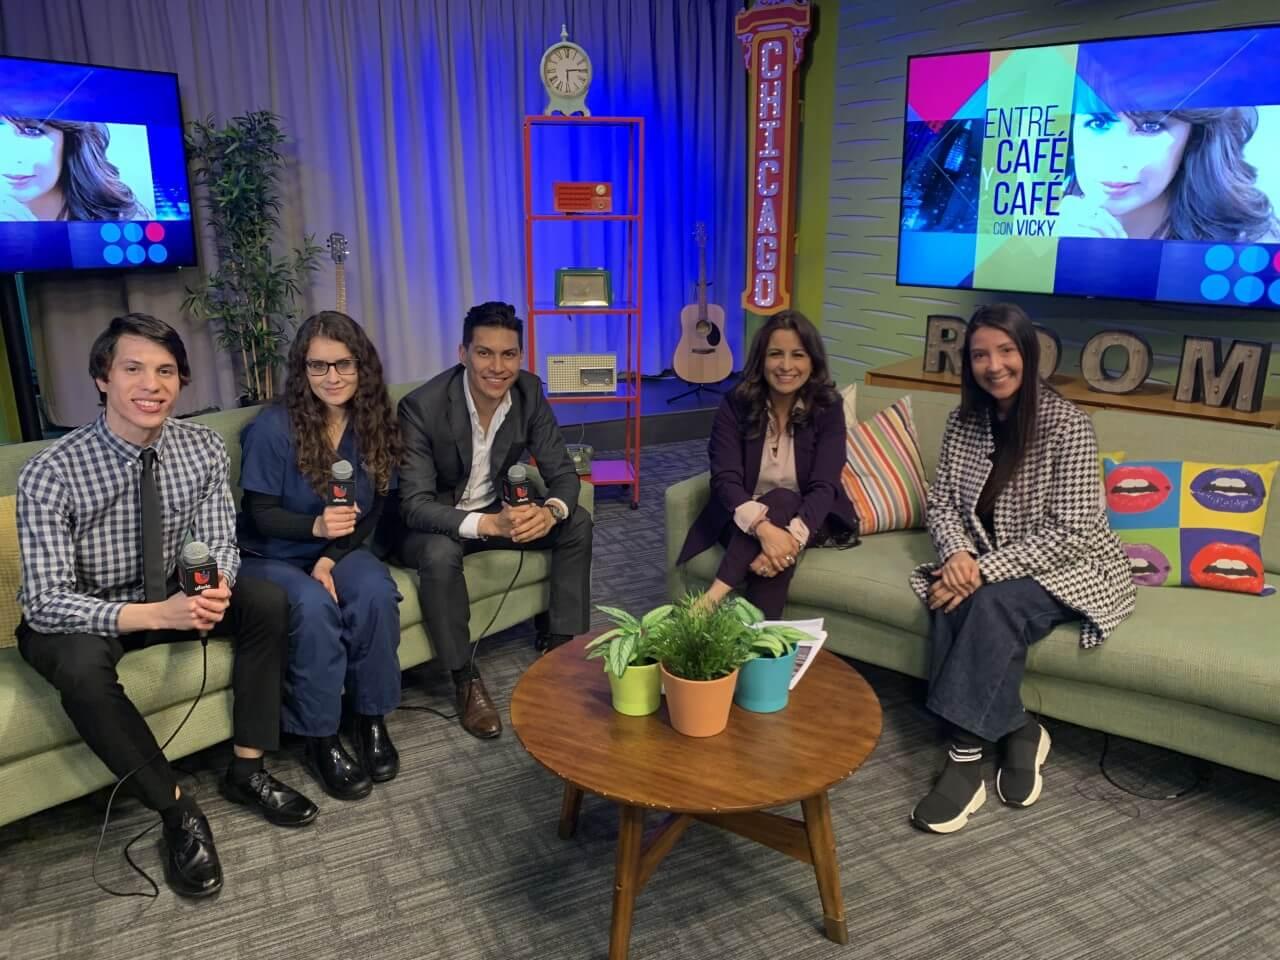 Univision Amor 106.7 FM's Entre Cafe y Cafe con Vicky